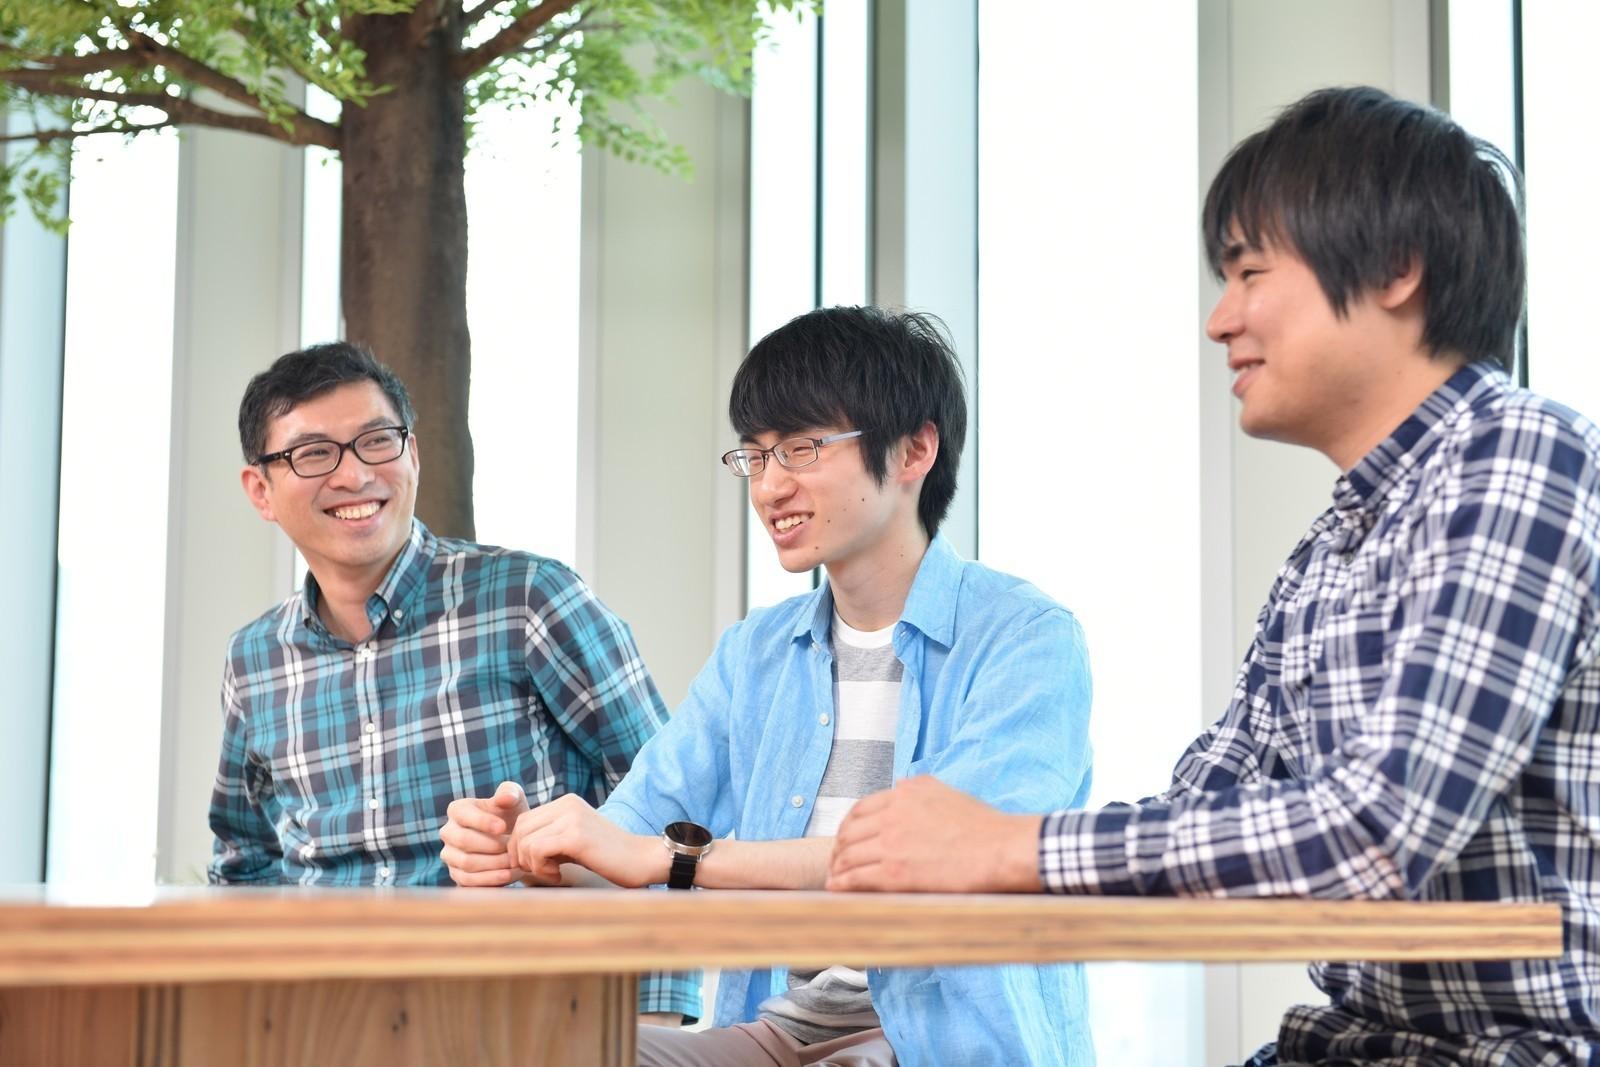 IDCFクラウドをもっと使いやすくパワフルにしたいRubyエンジニアを募集!